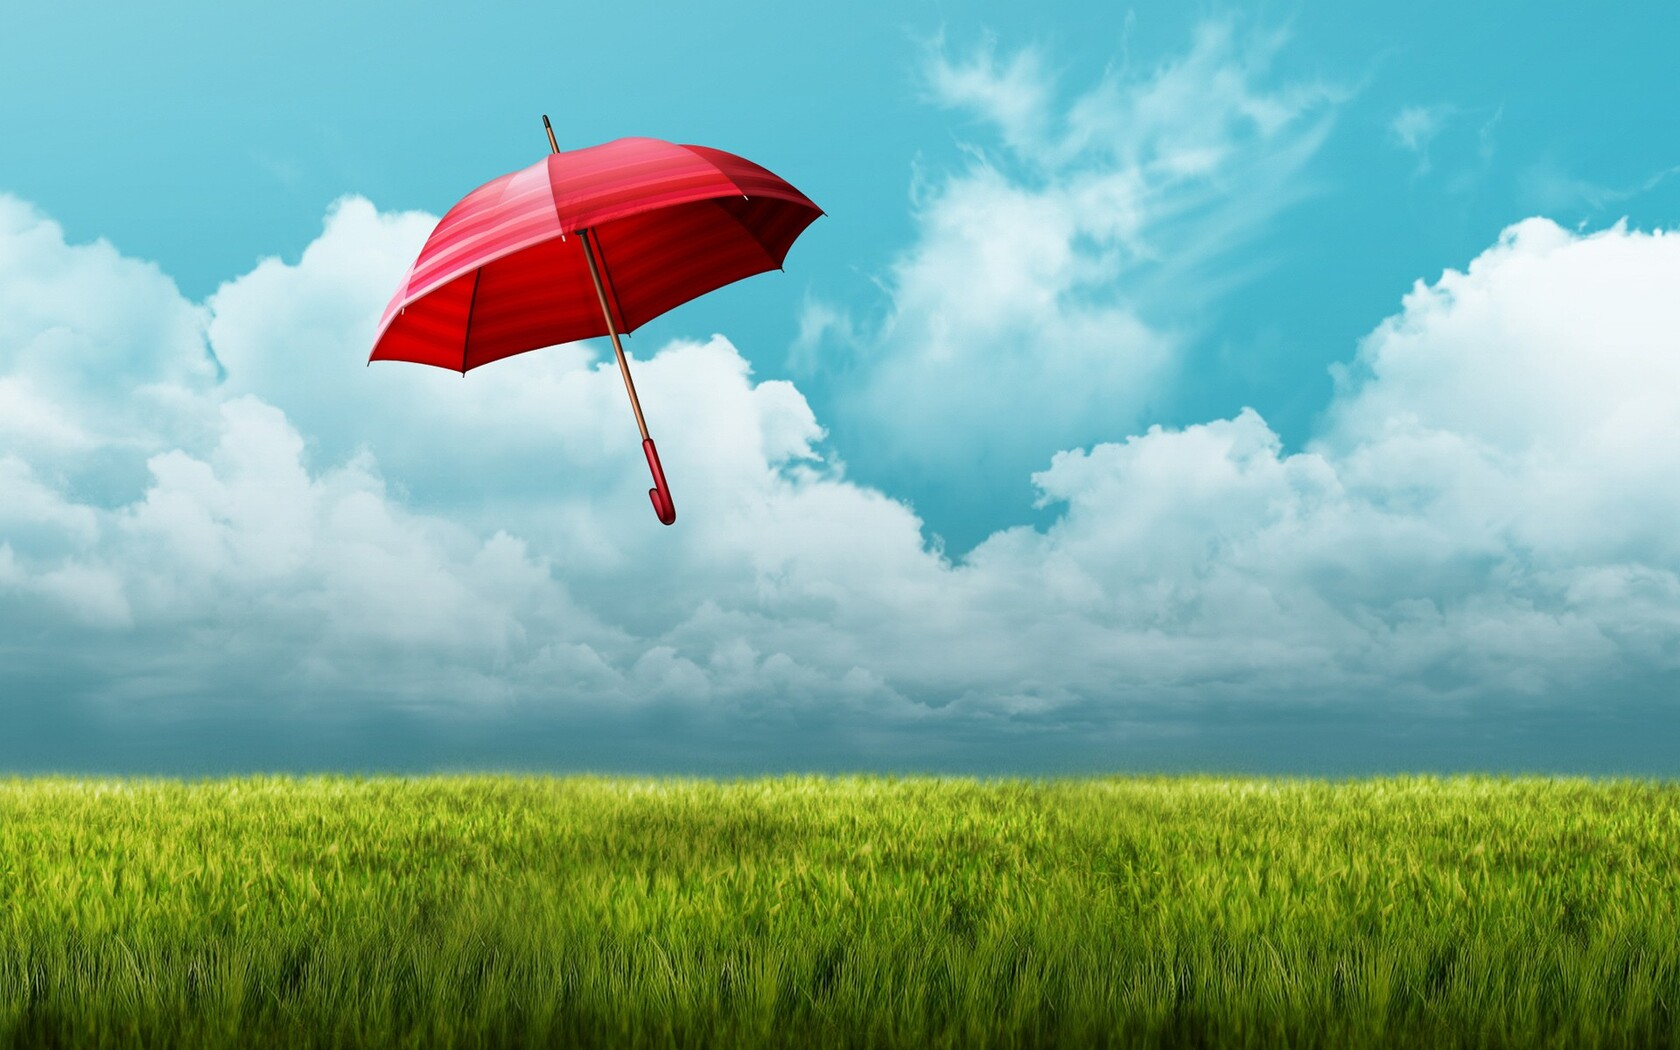 umbrella-fields.jpg